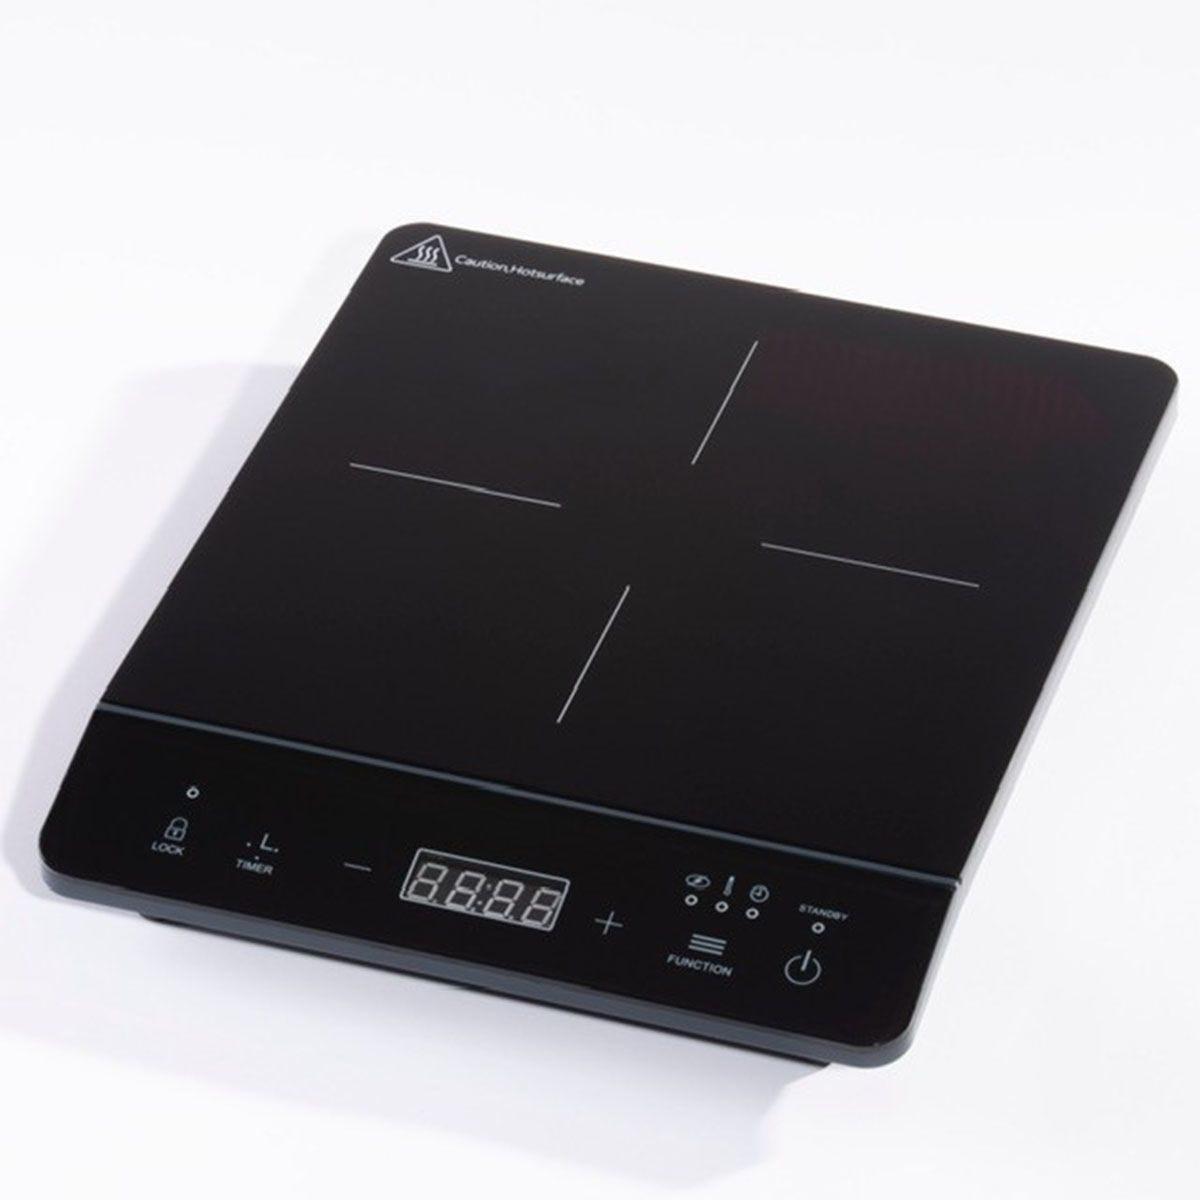 Daewoo SDA1805 2000W Single Induction Hob - Black